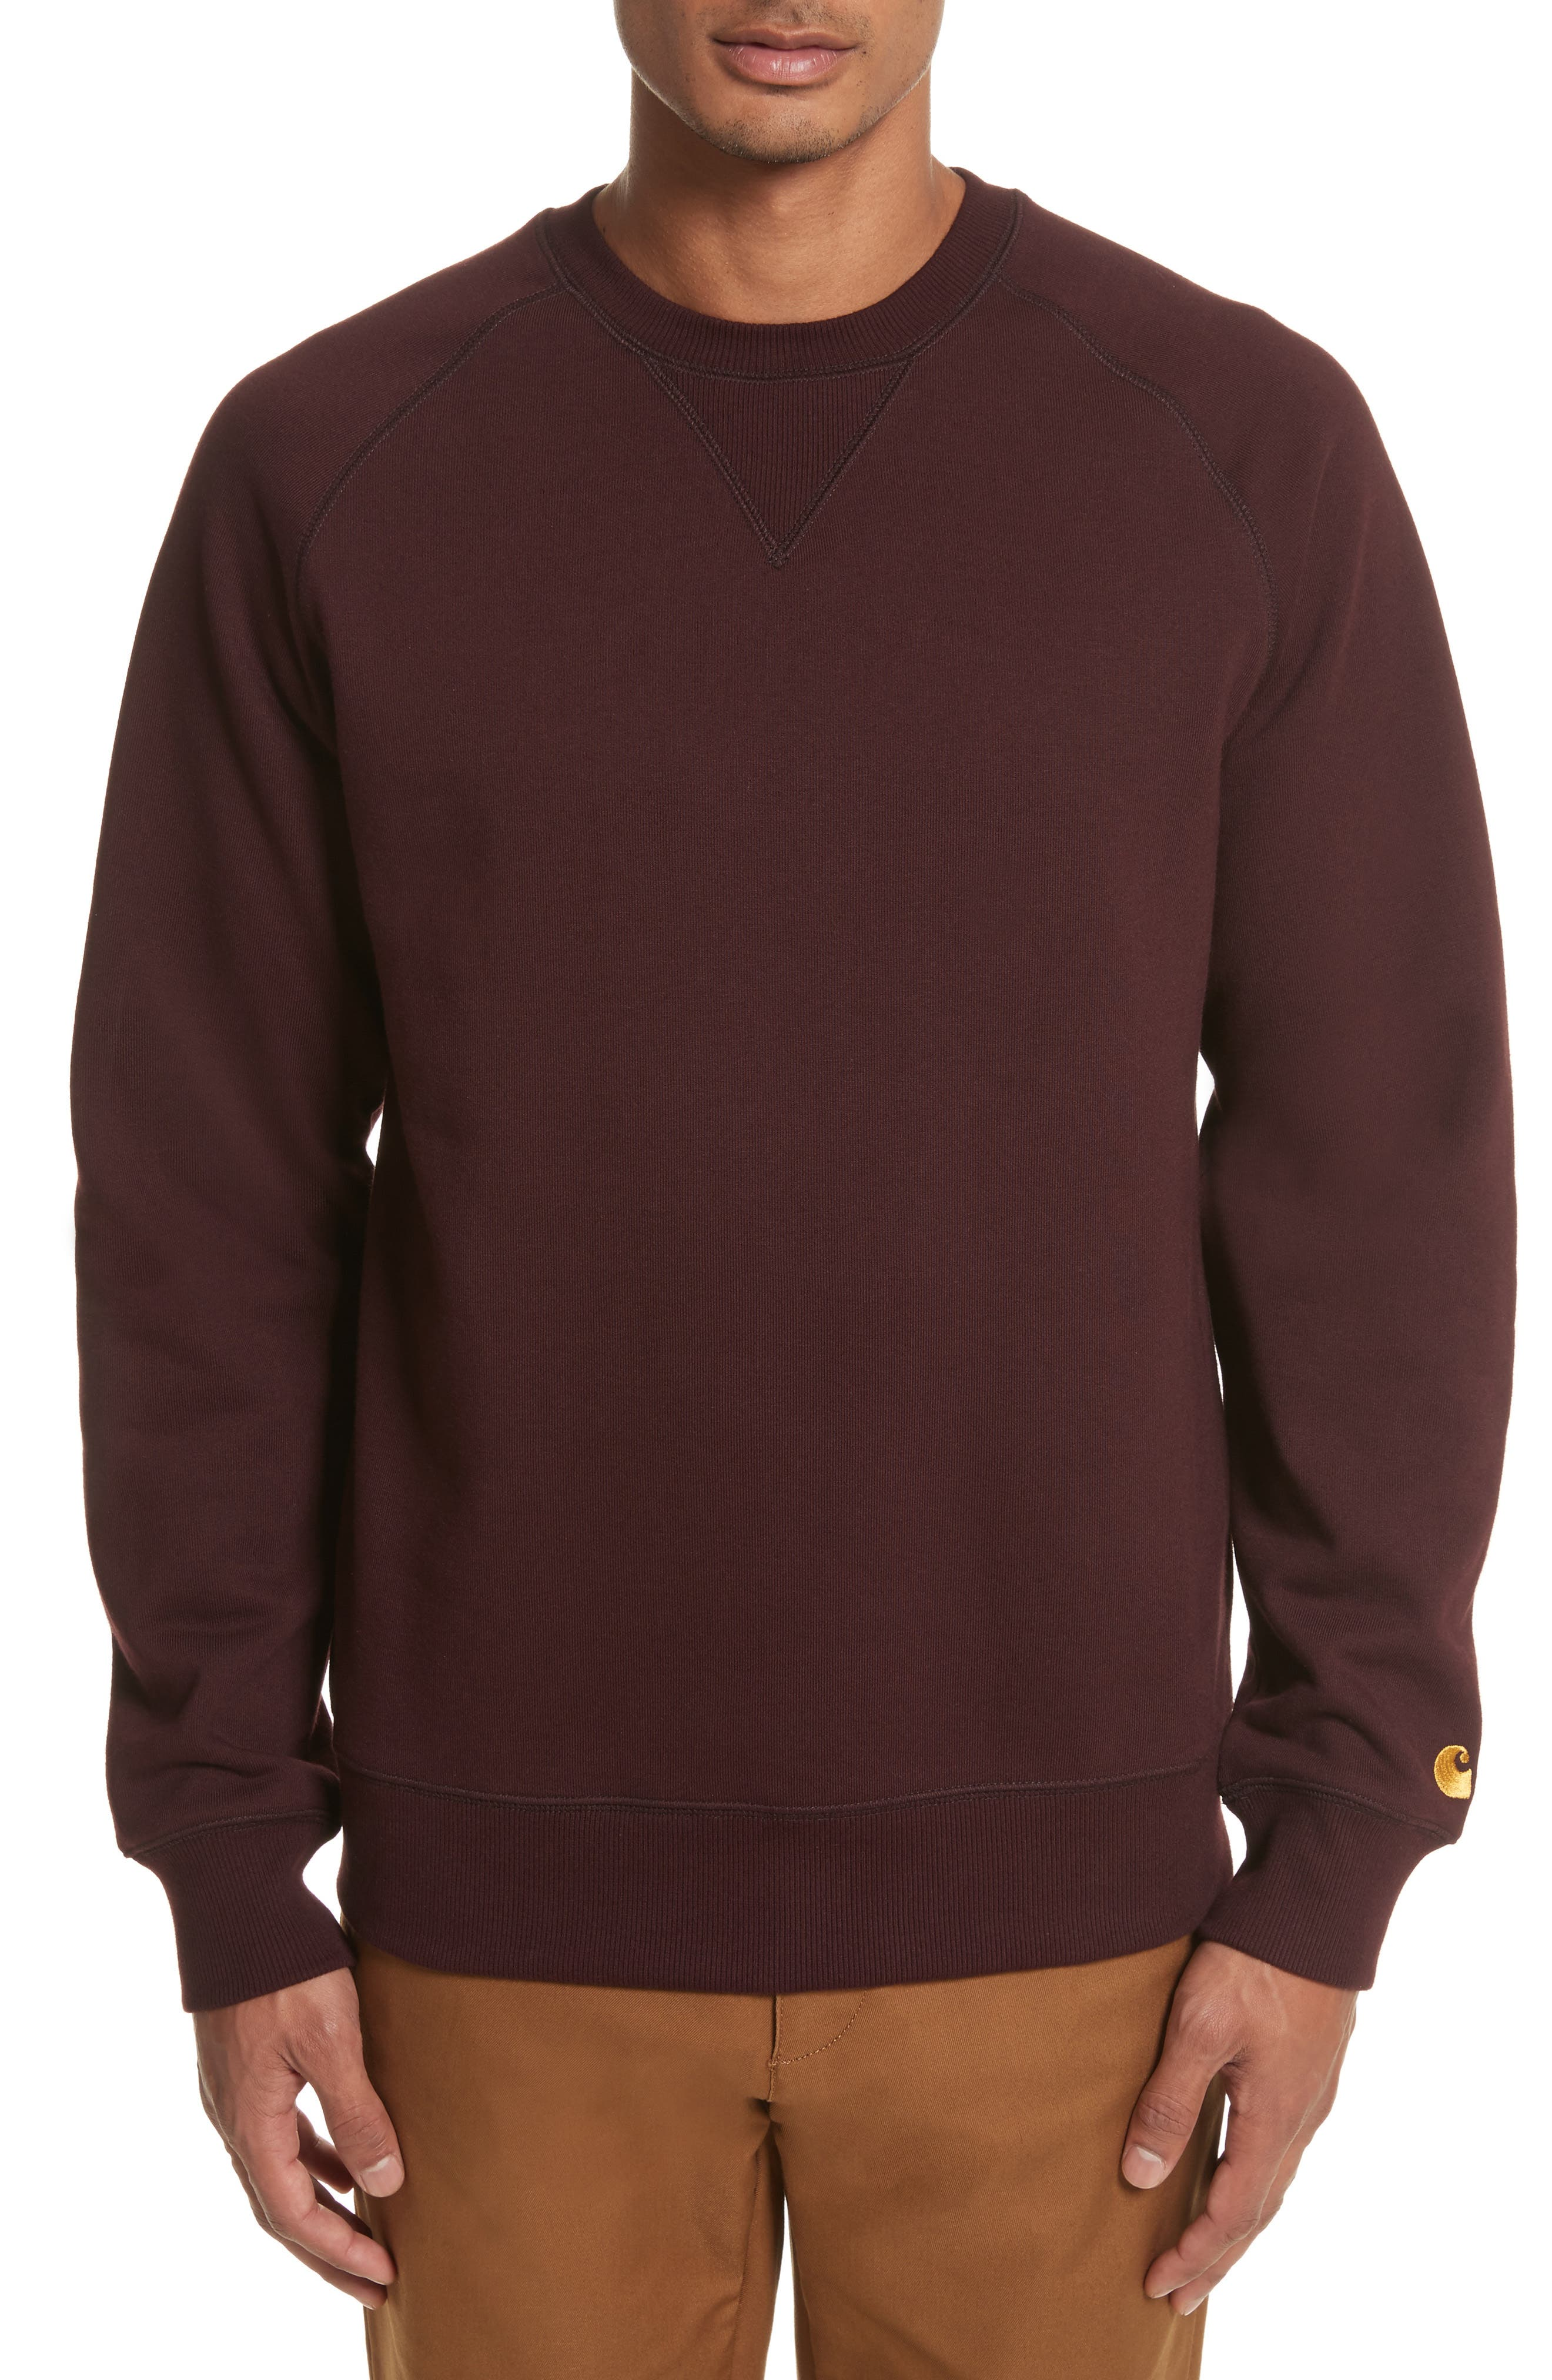 Crewneck Sweatshirt,                             Main thumbnail 1, color,                             930